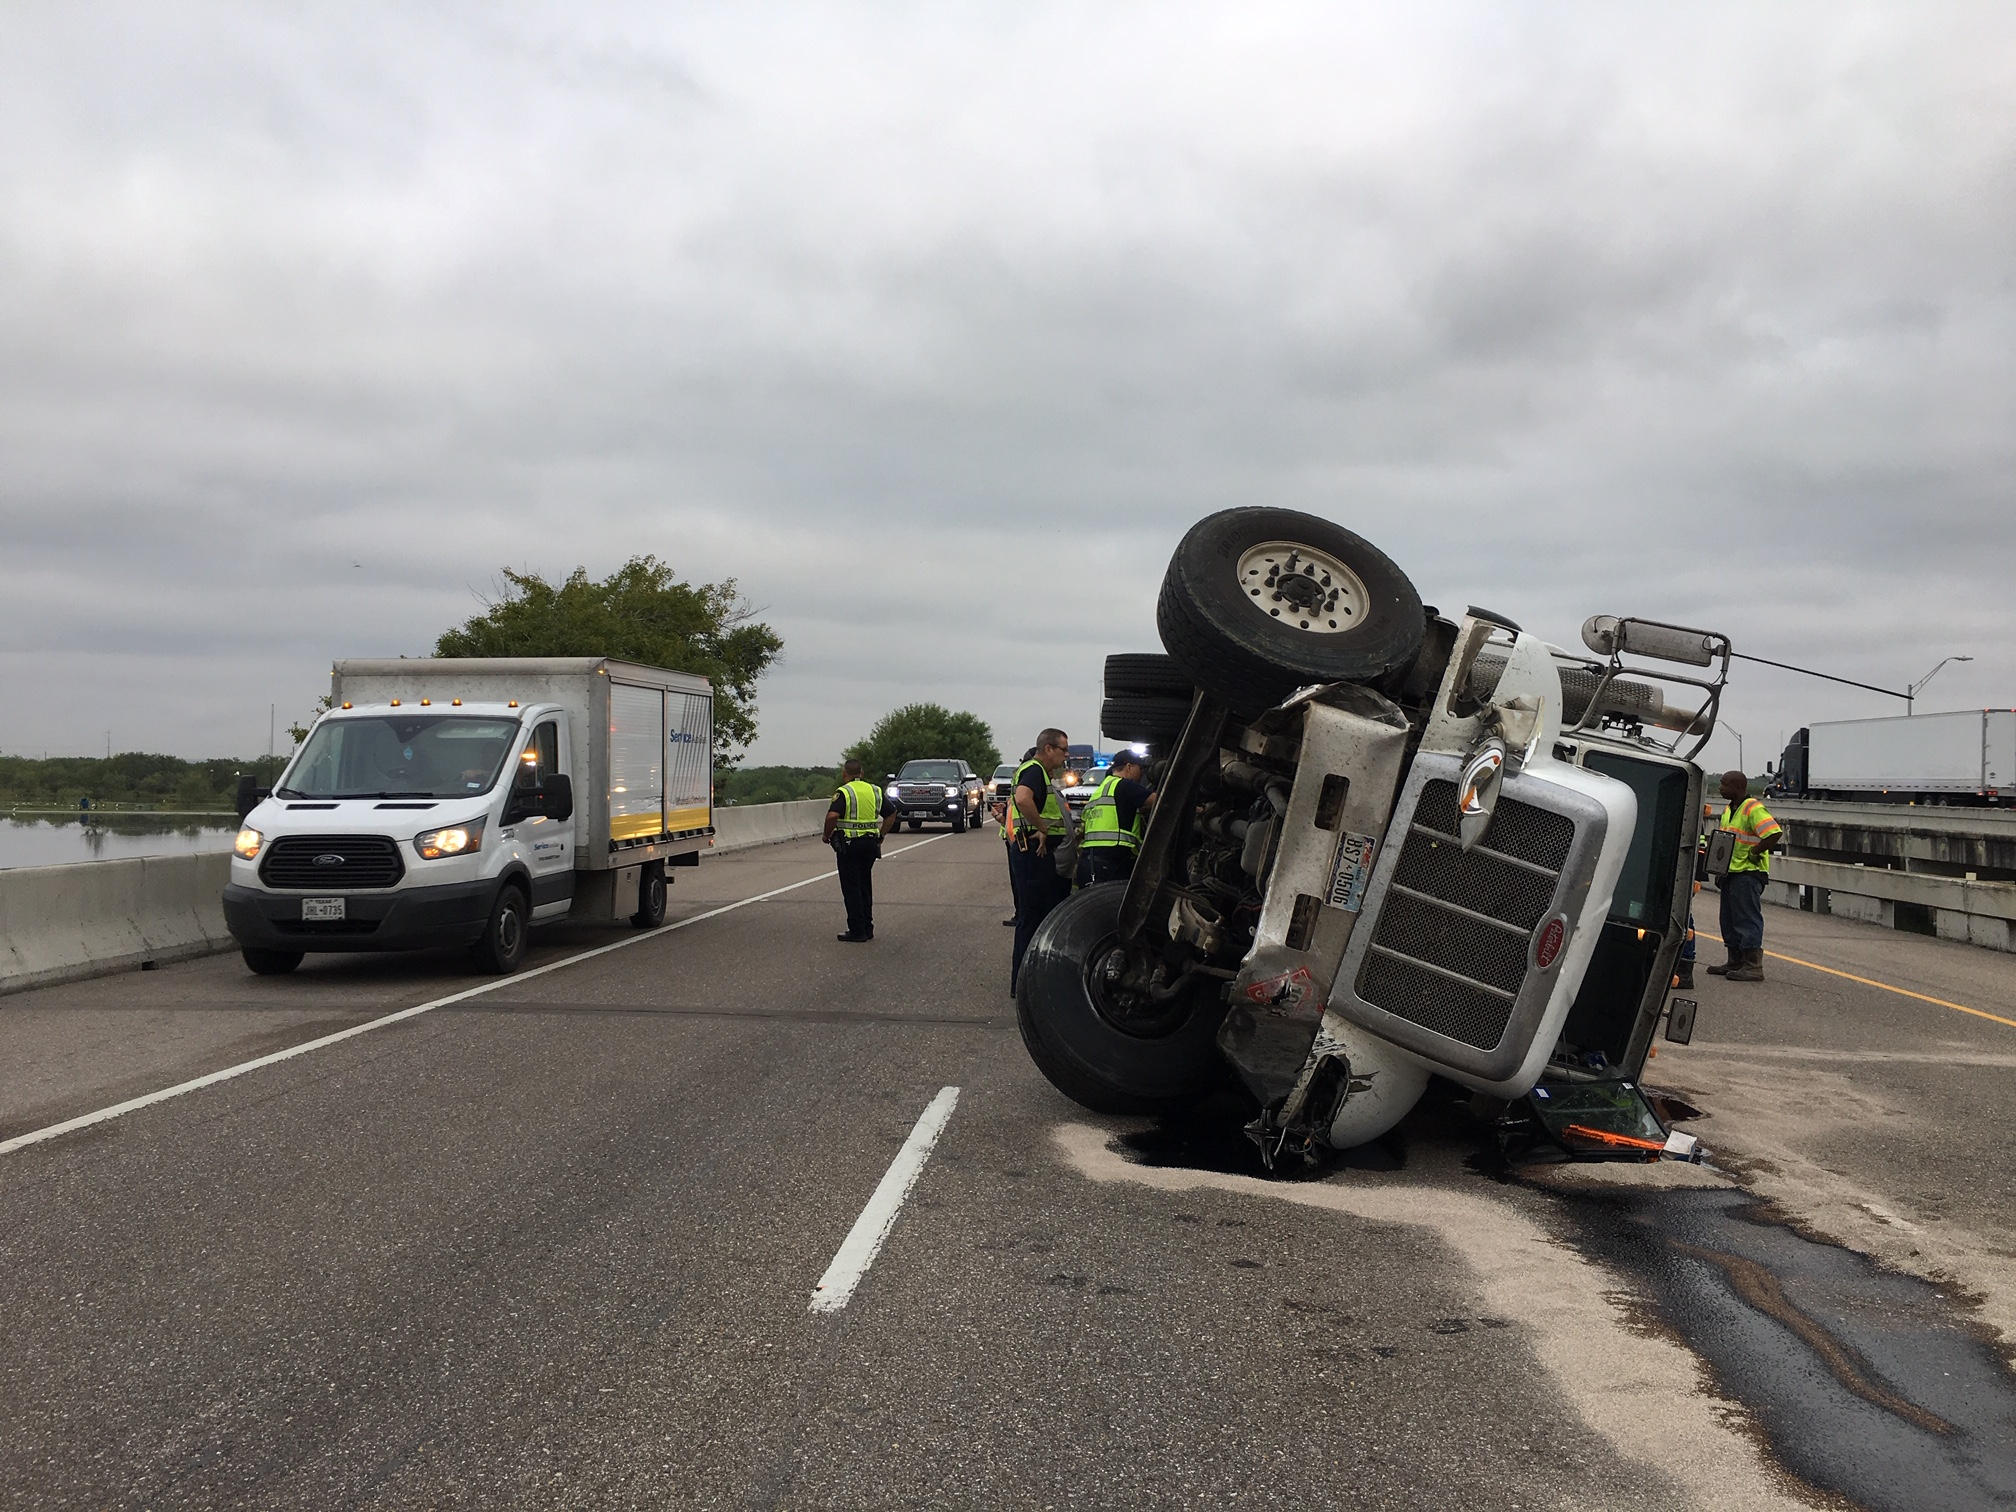 Accident at Labonte Park bridge shuts down lanes of I37